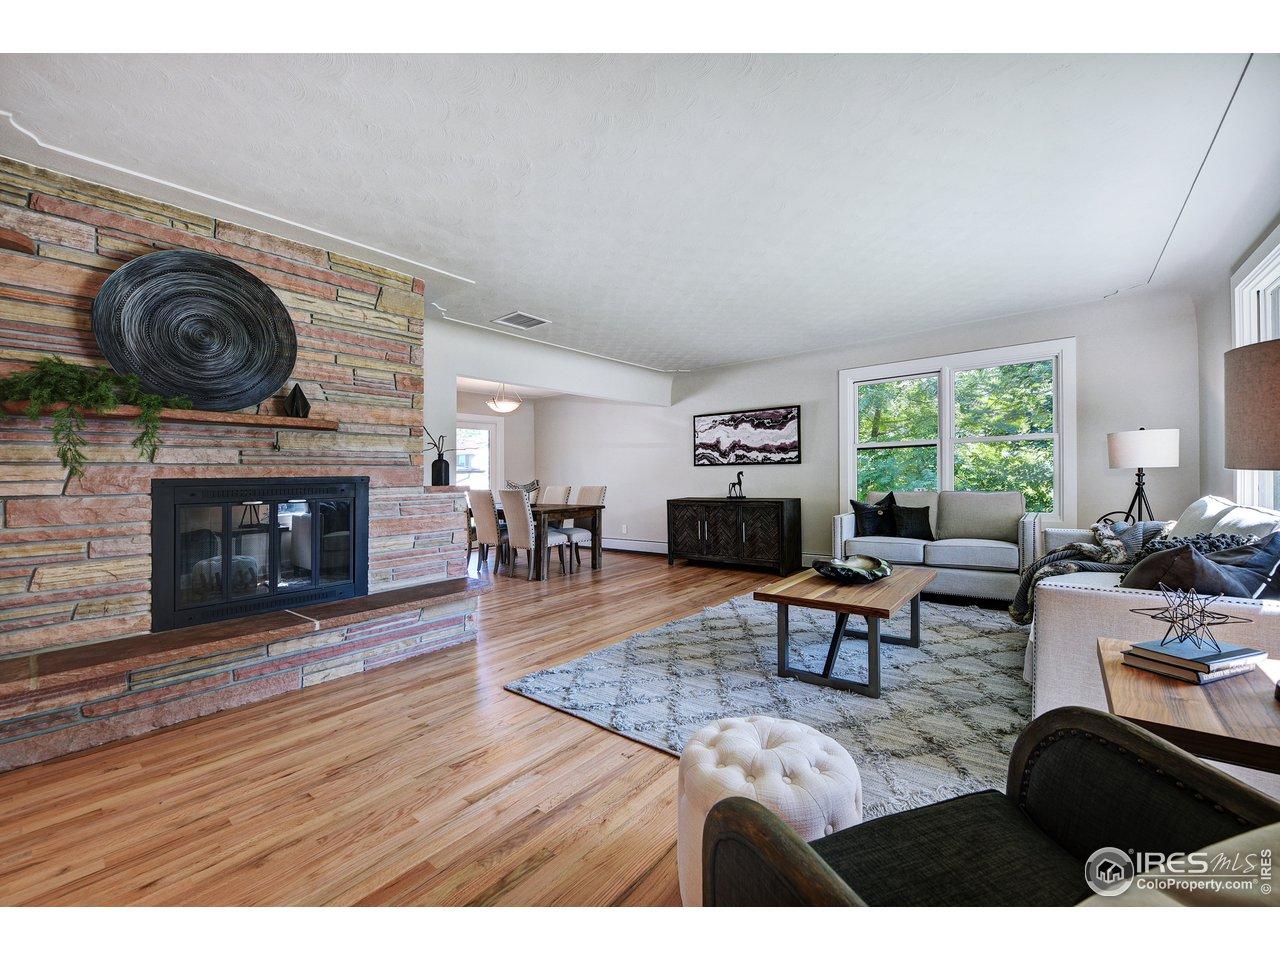 Living room with original flagstone fireplace